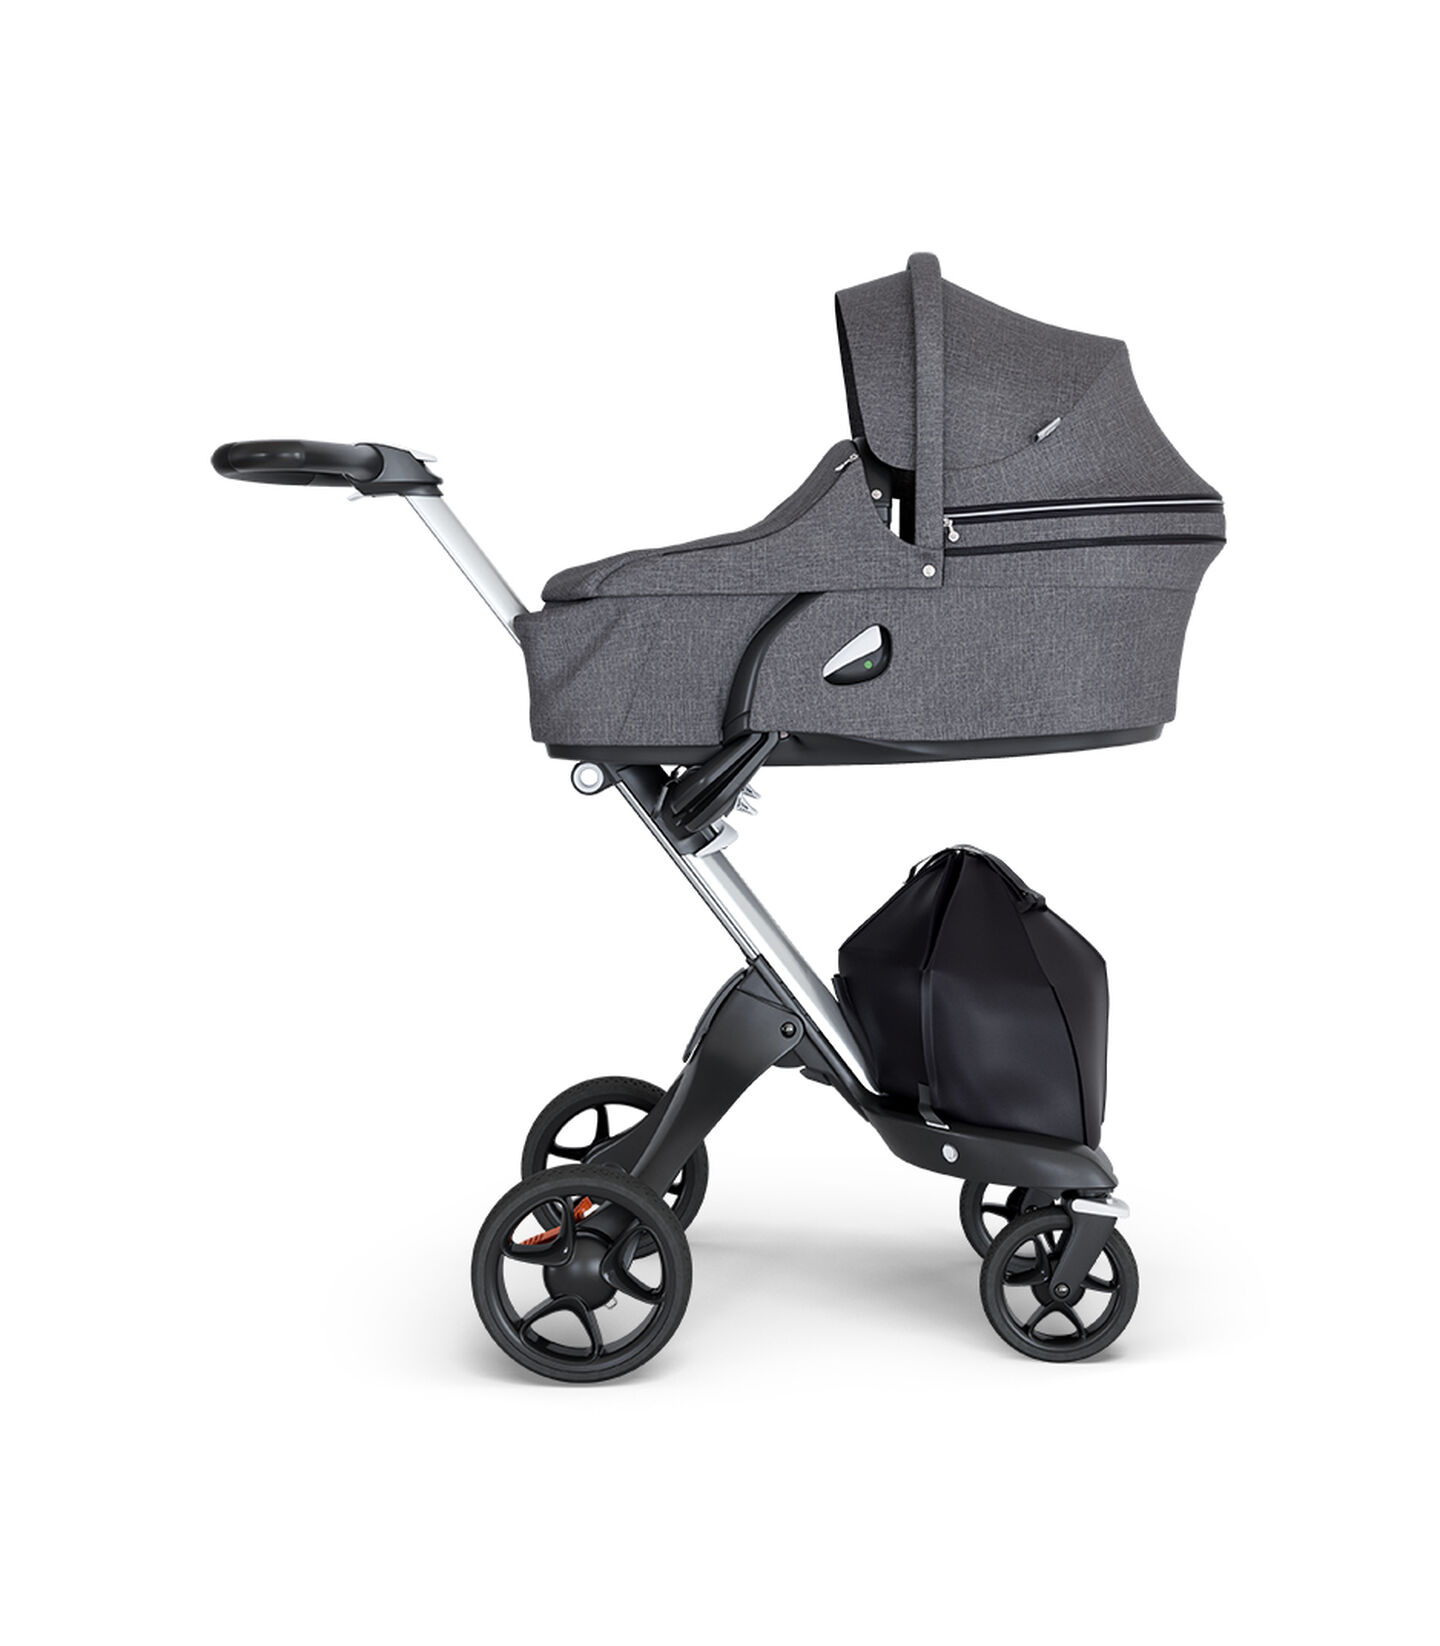 Stokke® Xplory® 6 Silver Chassis - Black Handle Black Melange, Negro Melange, mainview view 2